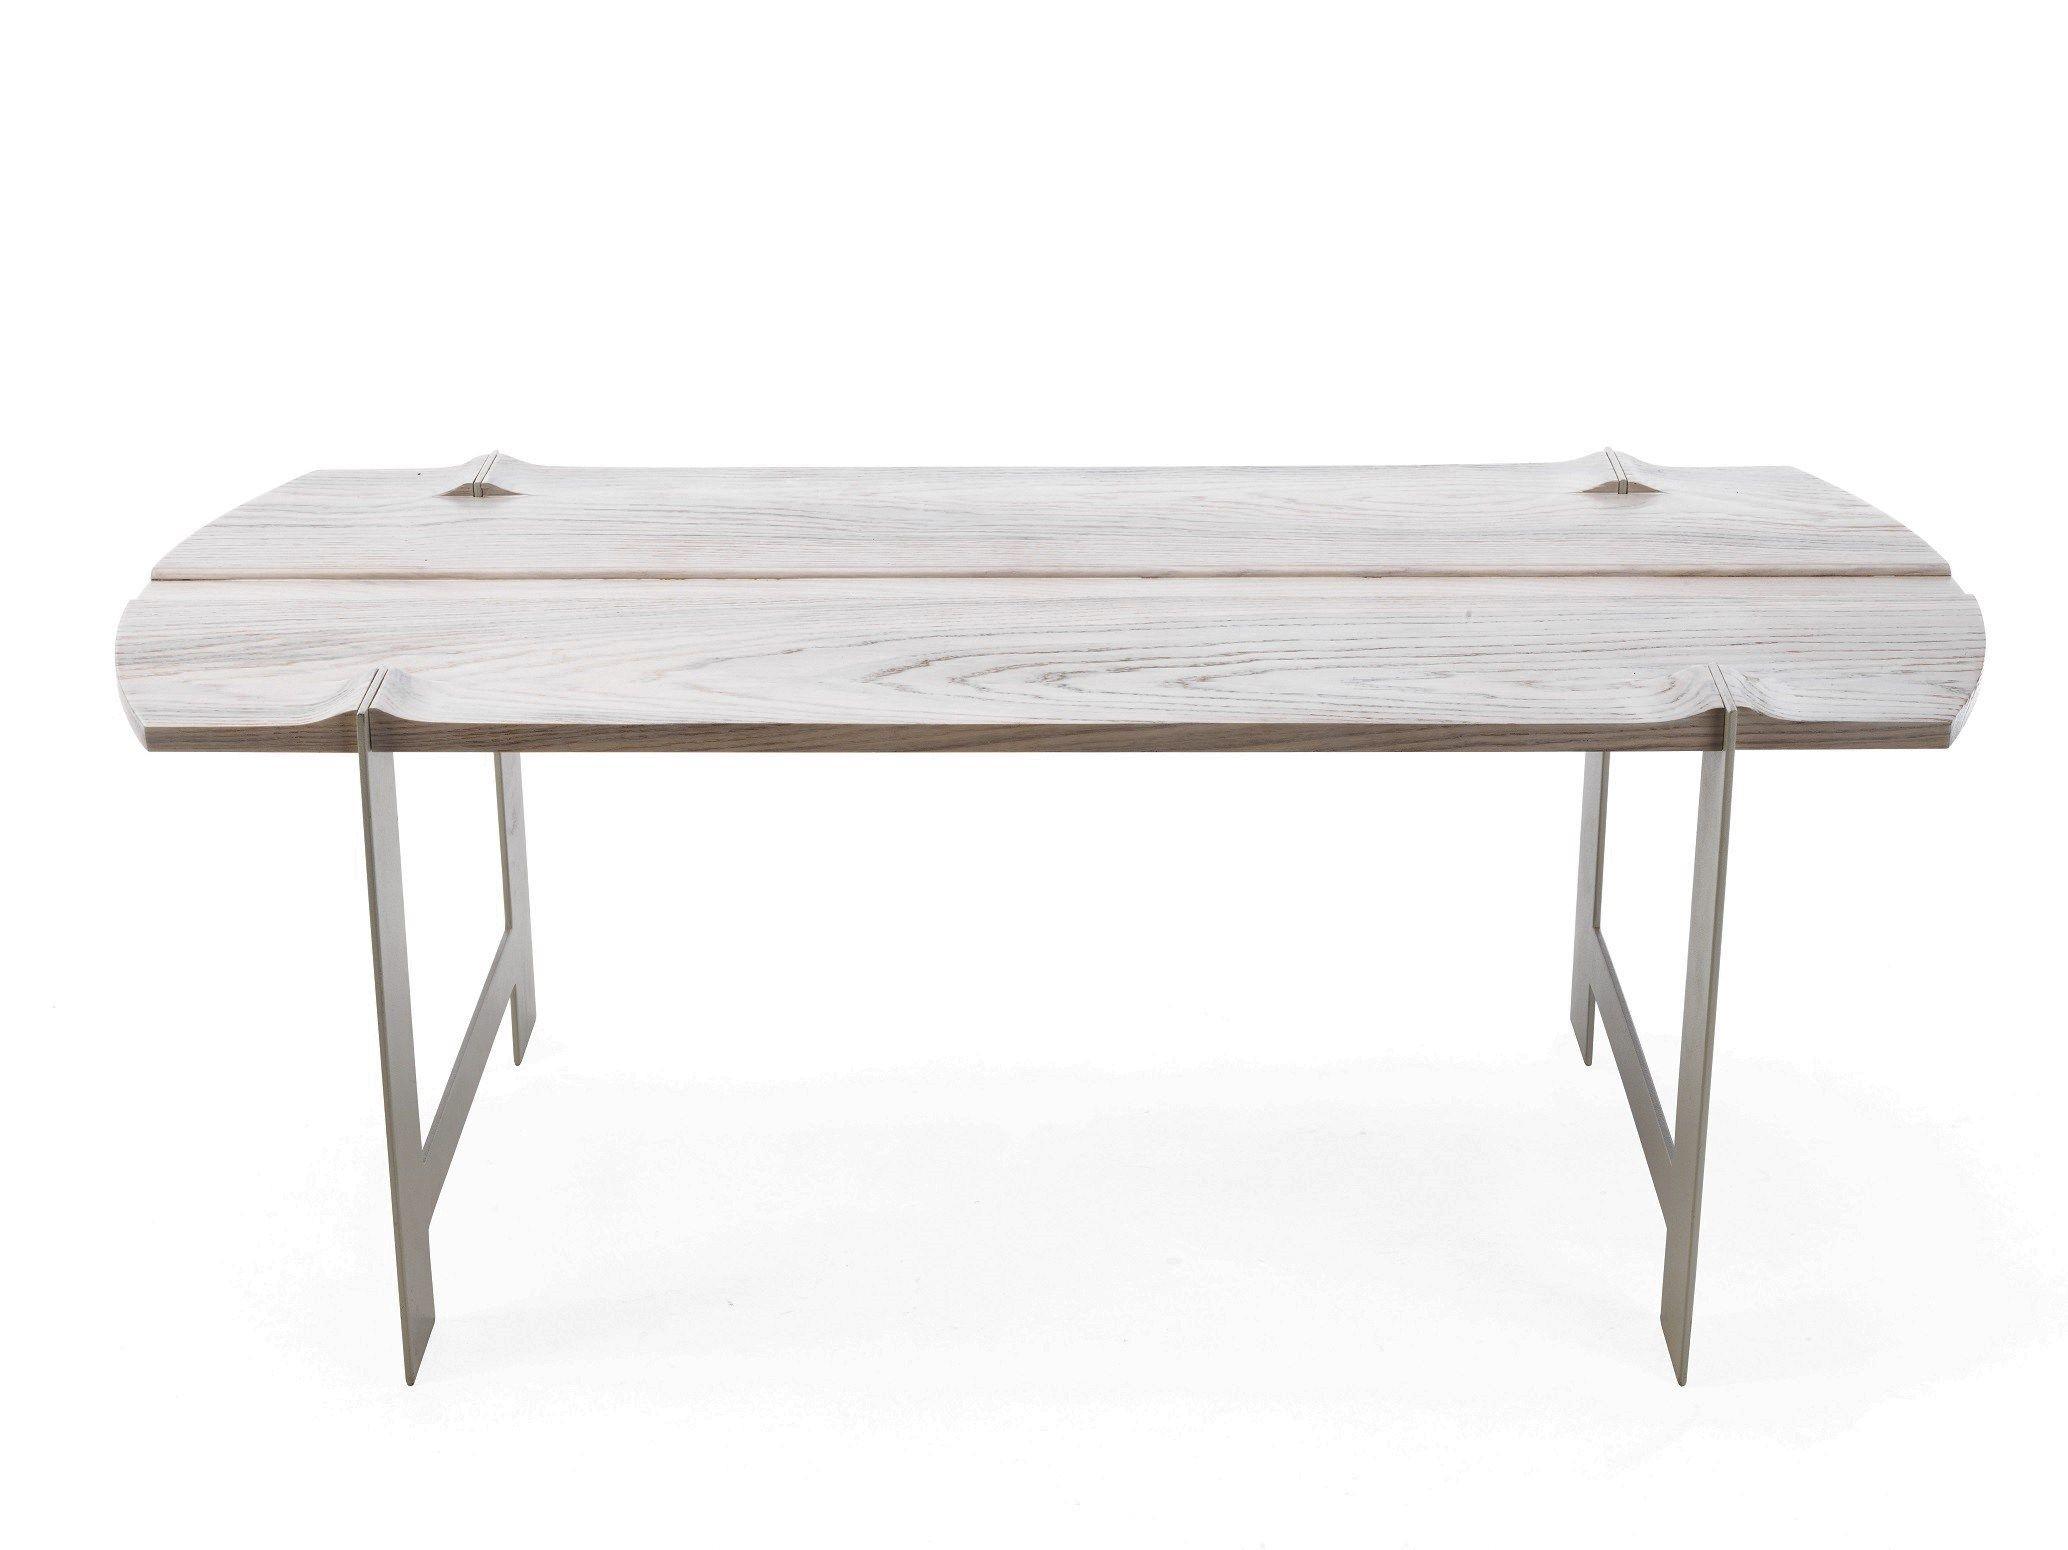 Luxe De solde Table Basse Schème